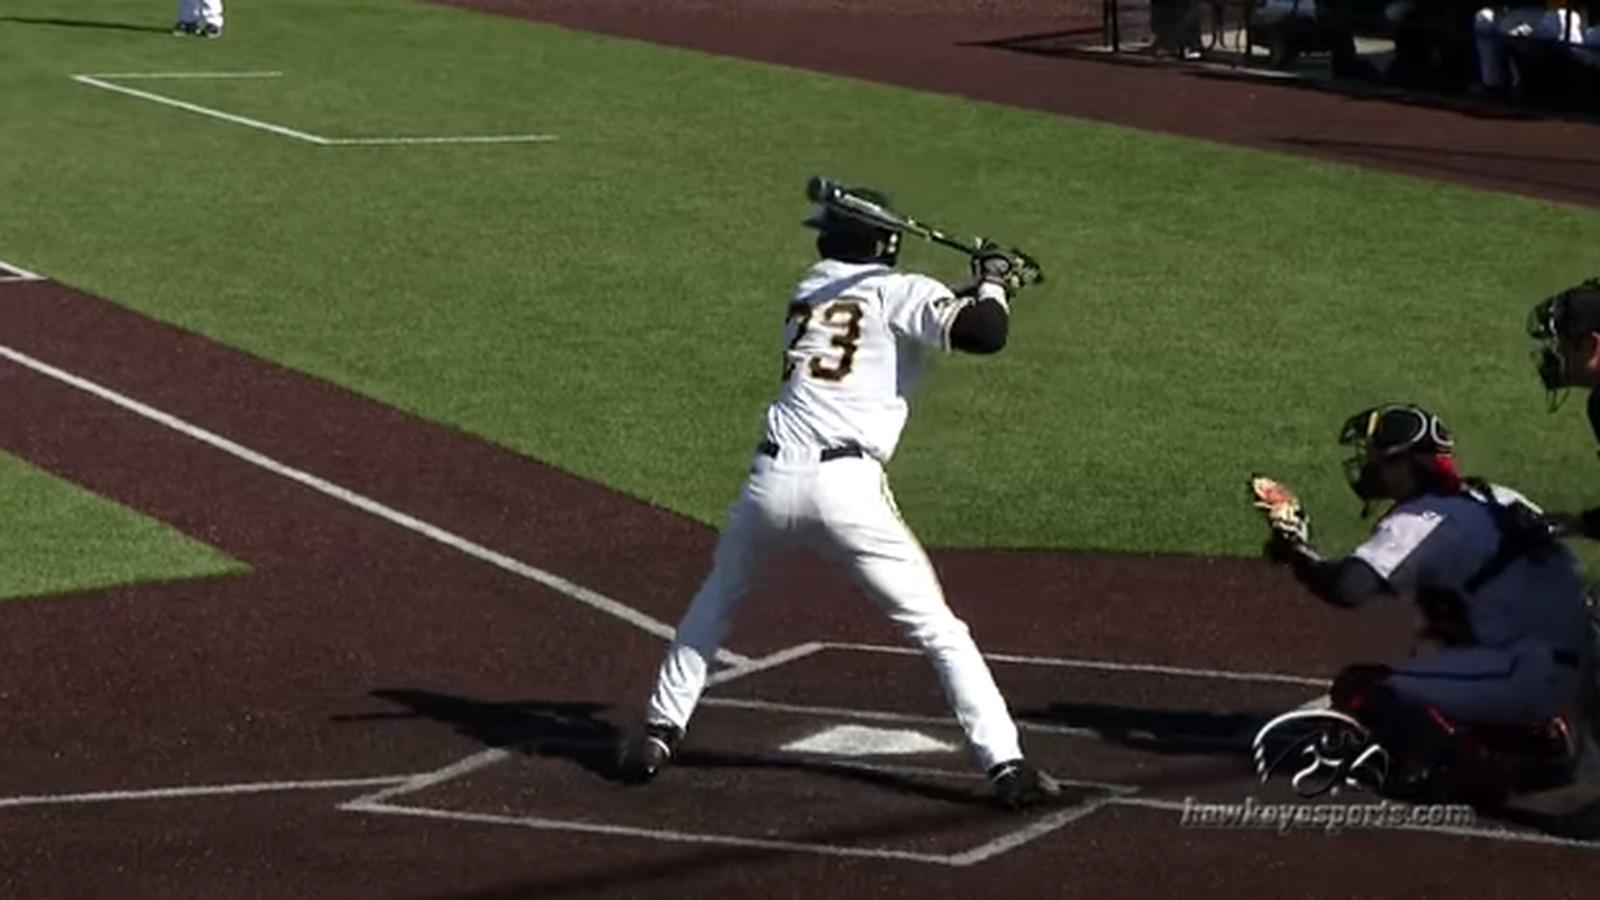 Iowa_baseball_booker_maryland_1.0.0